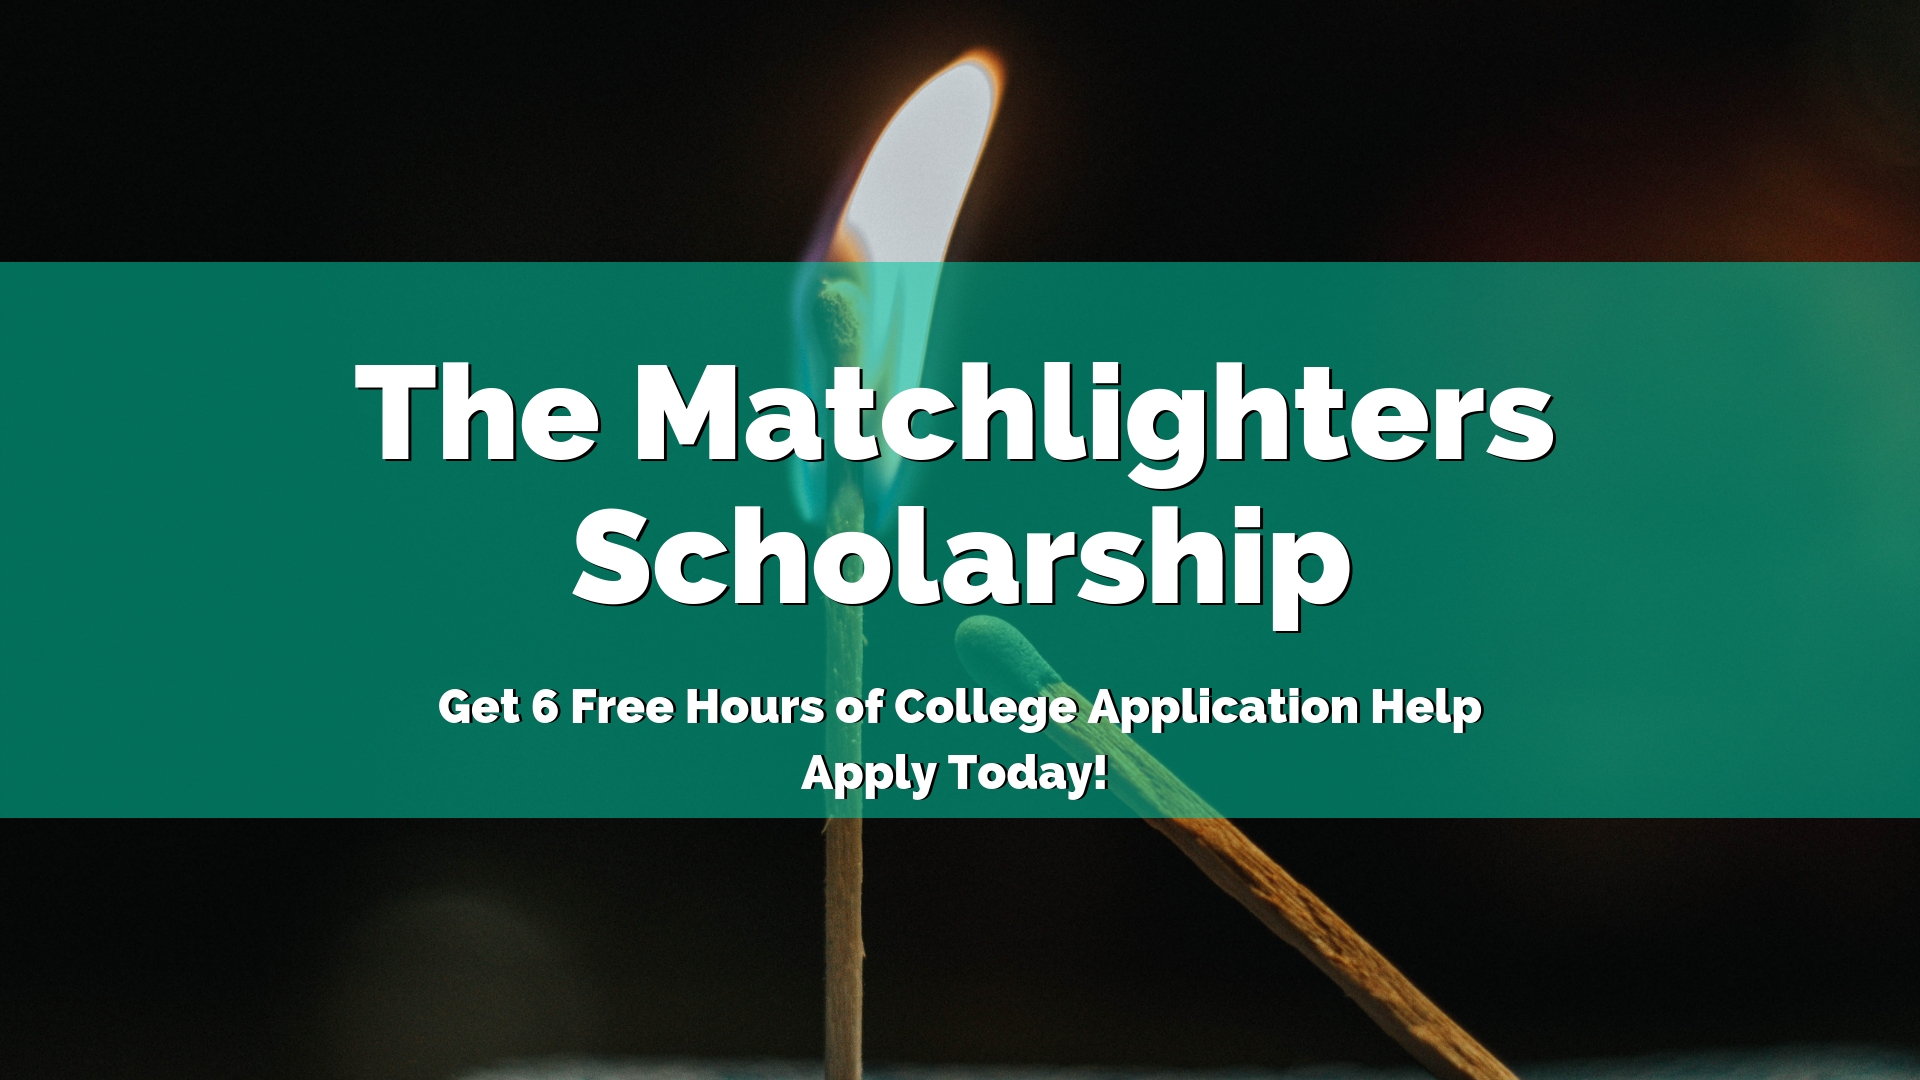 Matchlighters_banner.jpg